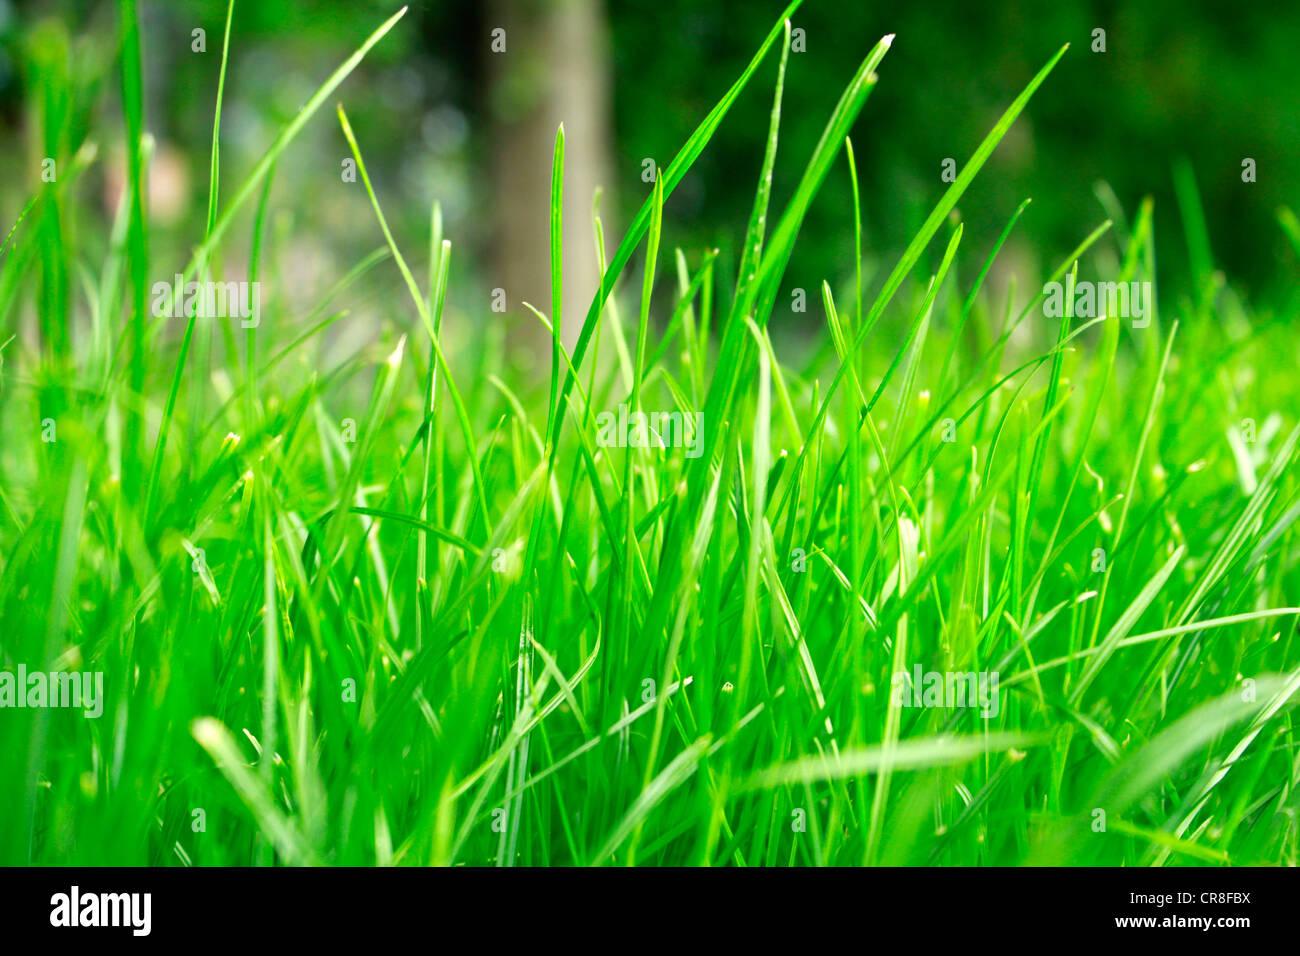 La pasto verde cerrar Imagen De Stock